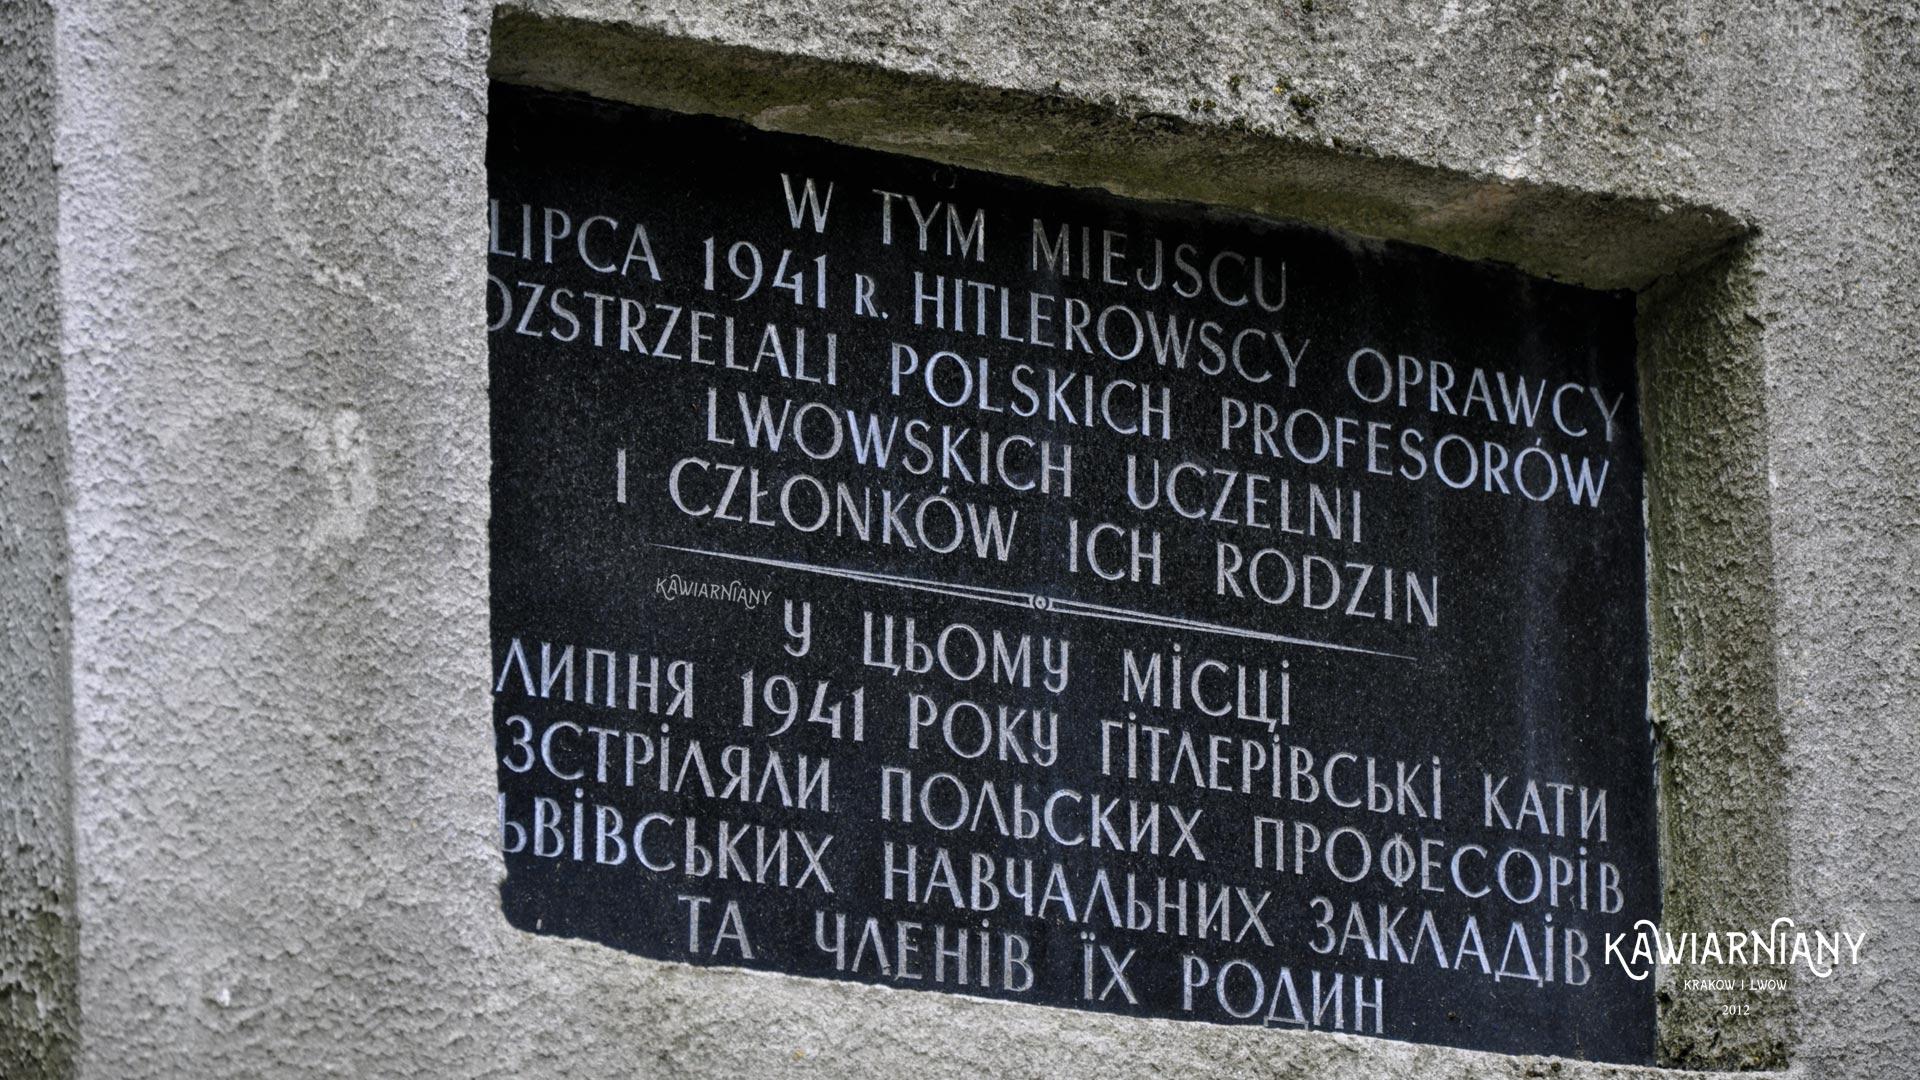 mord profesorów lwowskich